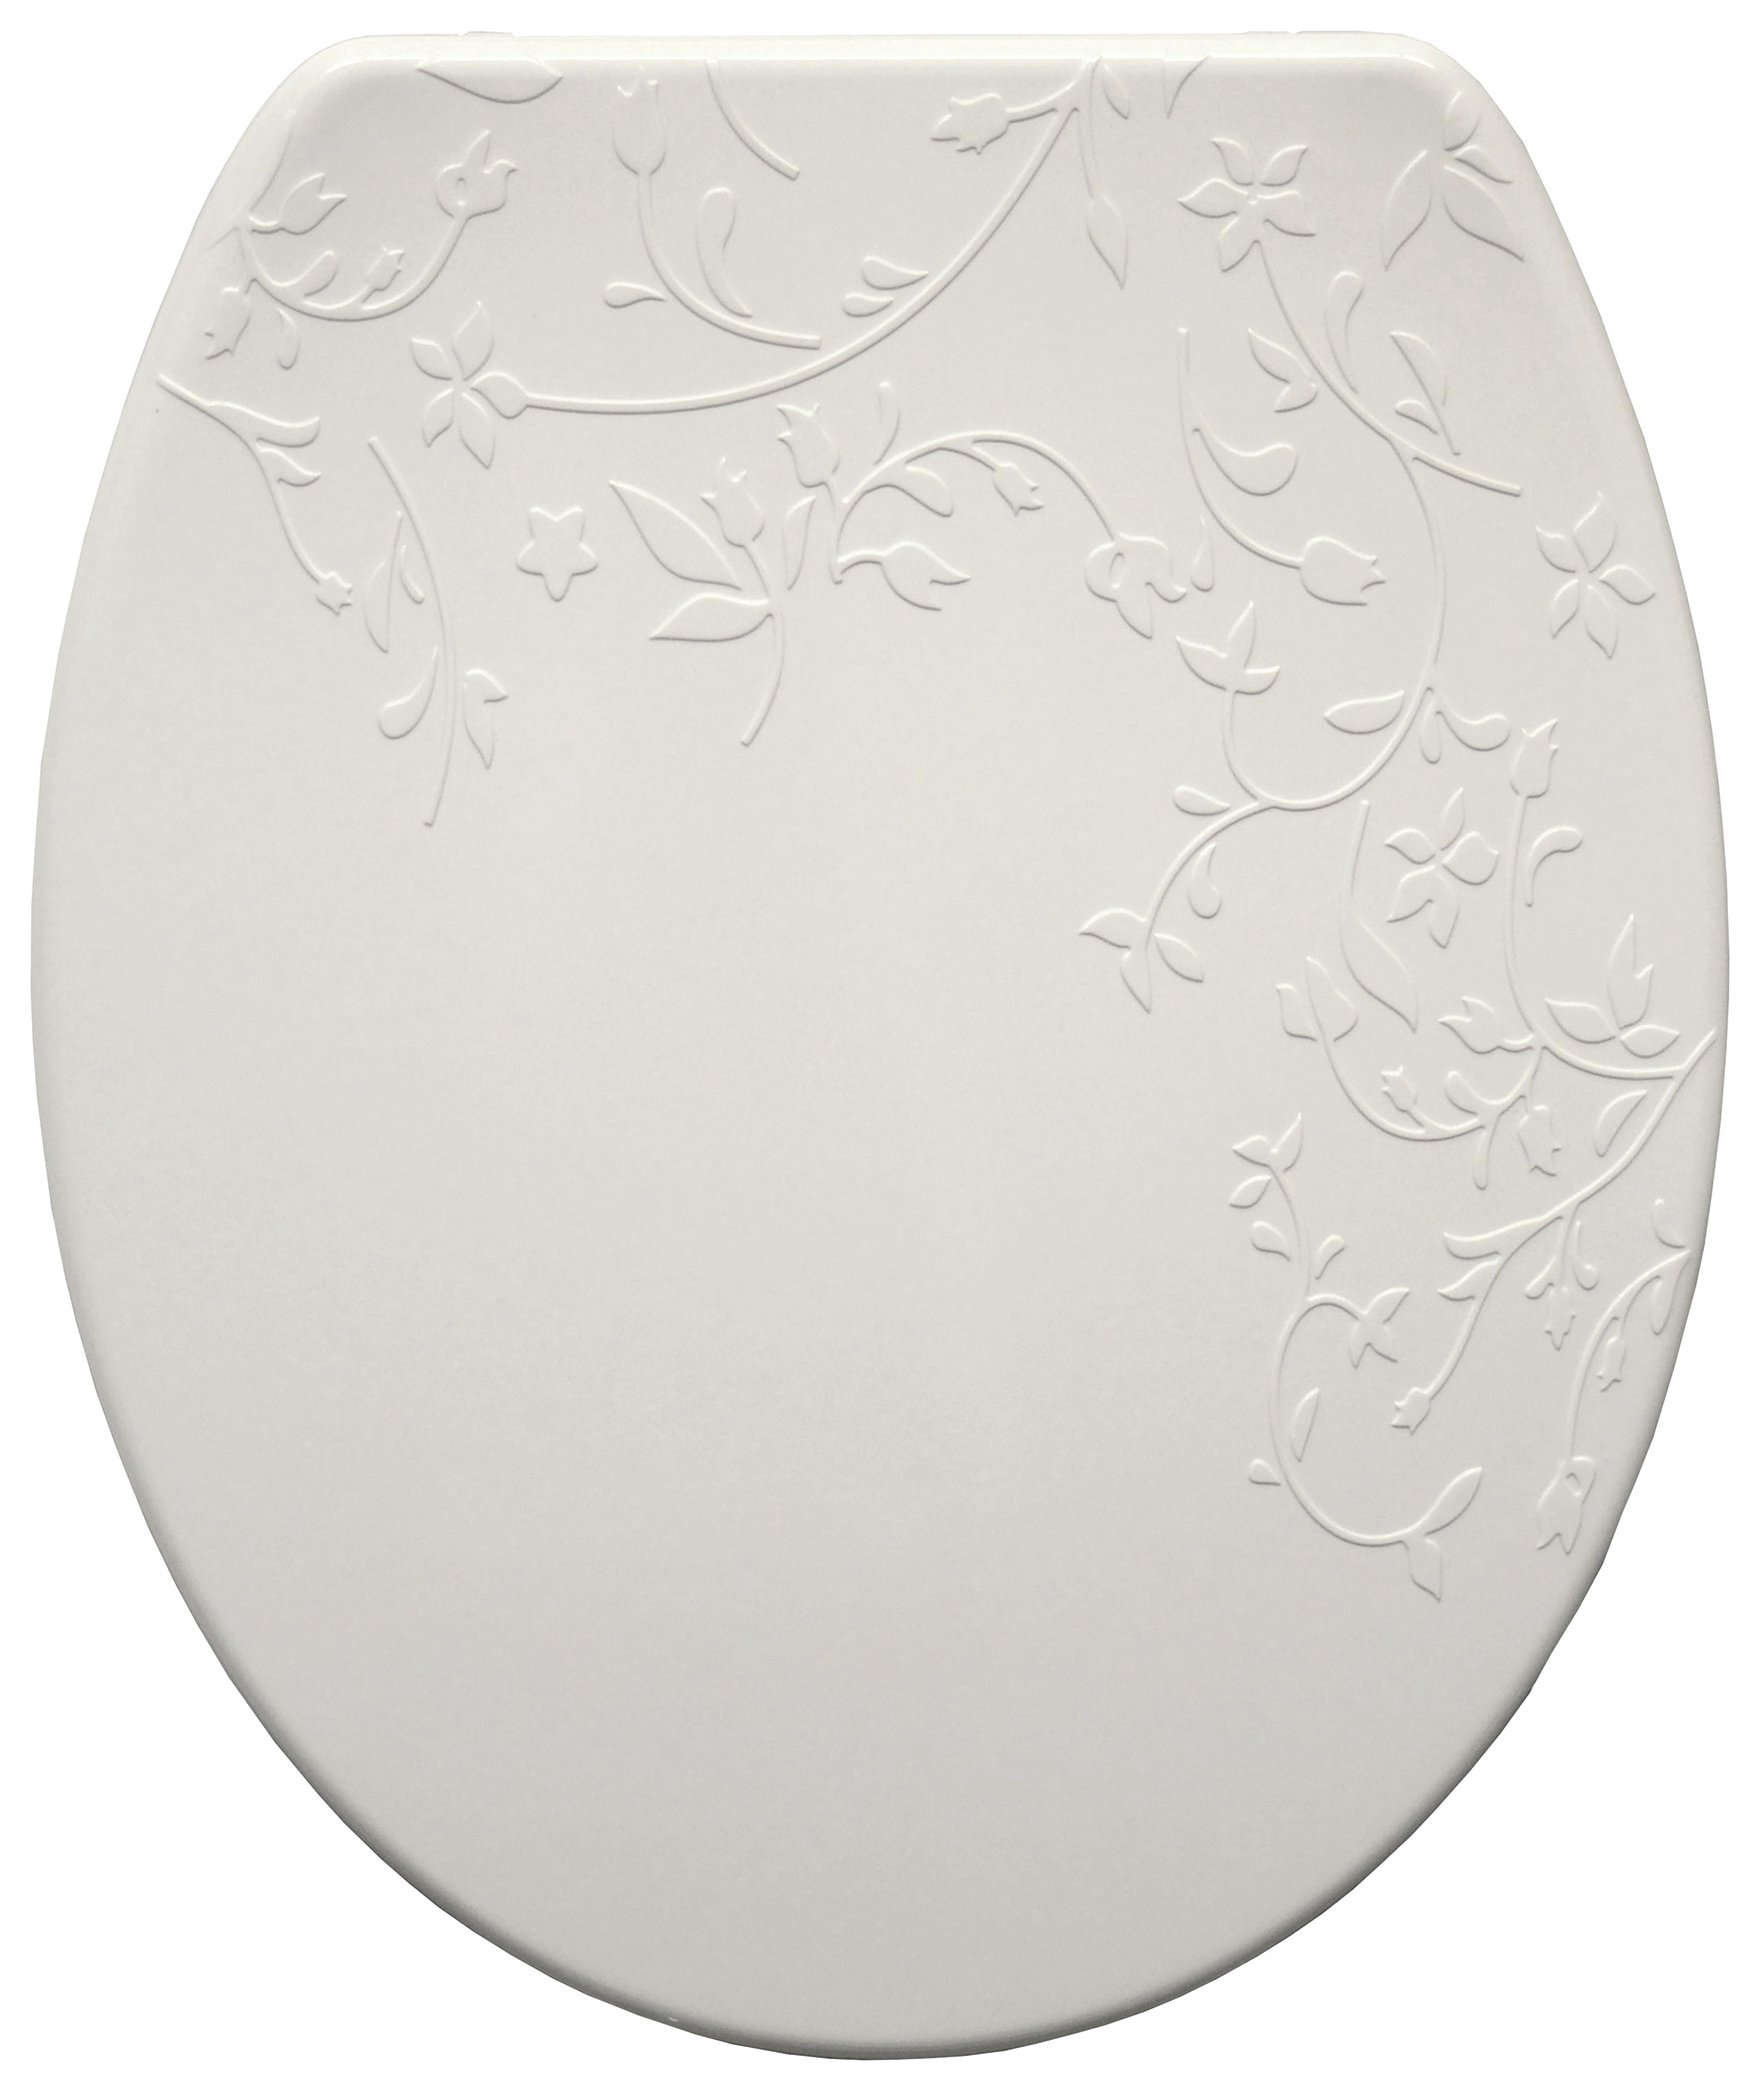 Bemis Fiore Thermoplastic Slow Close Toilet Seat - White